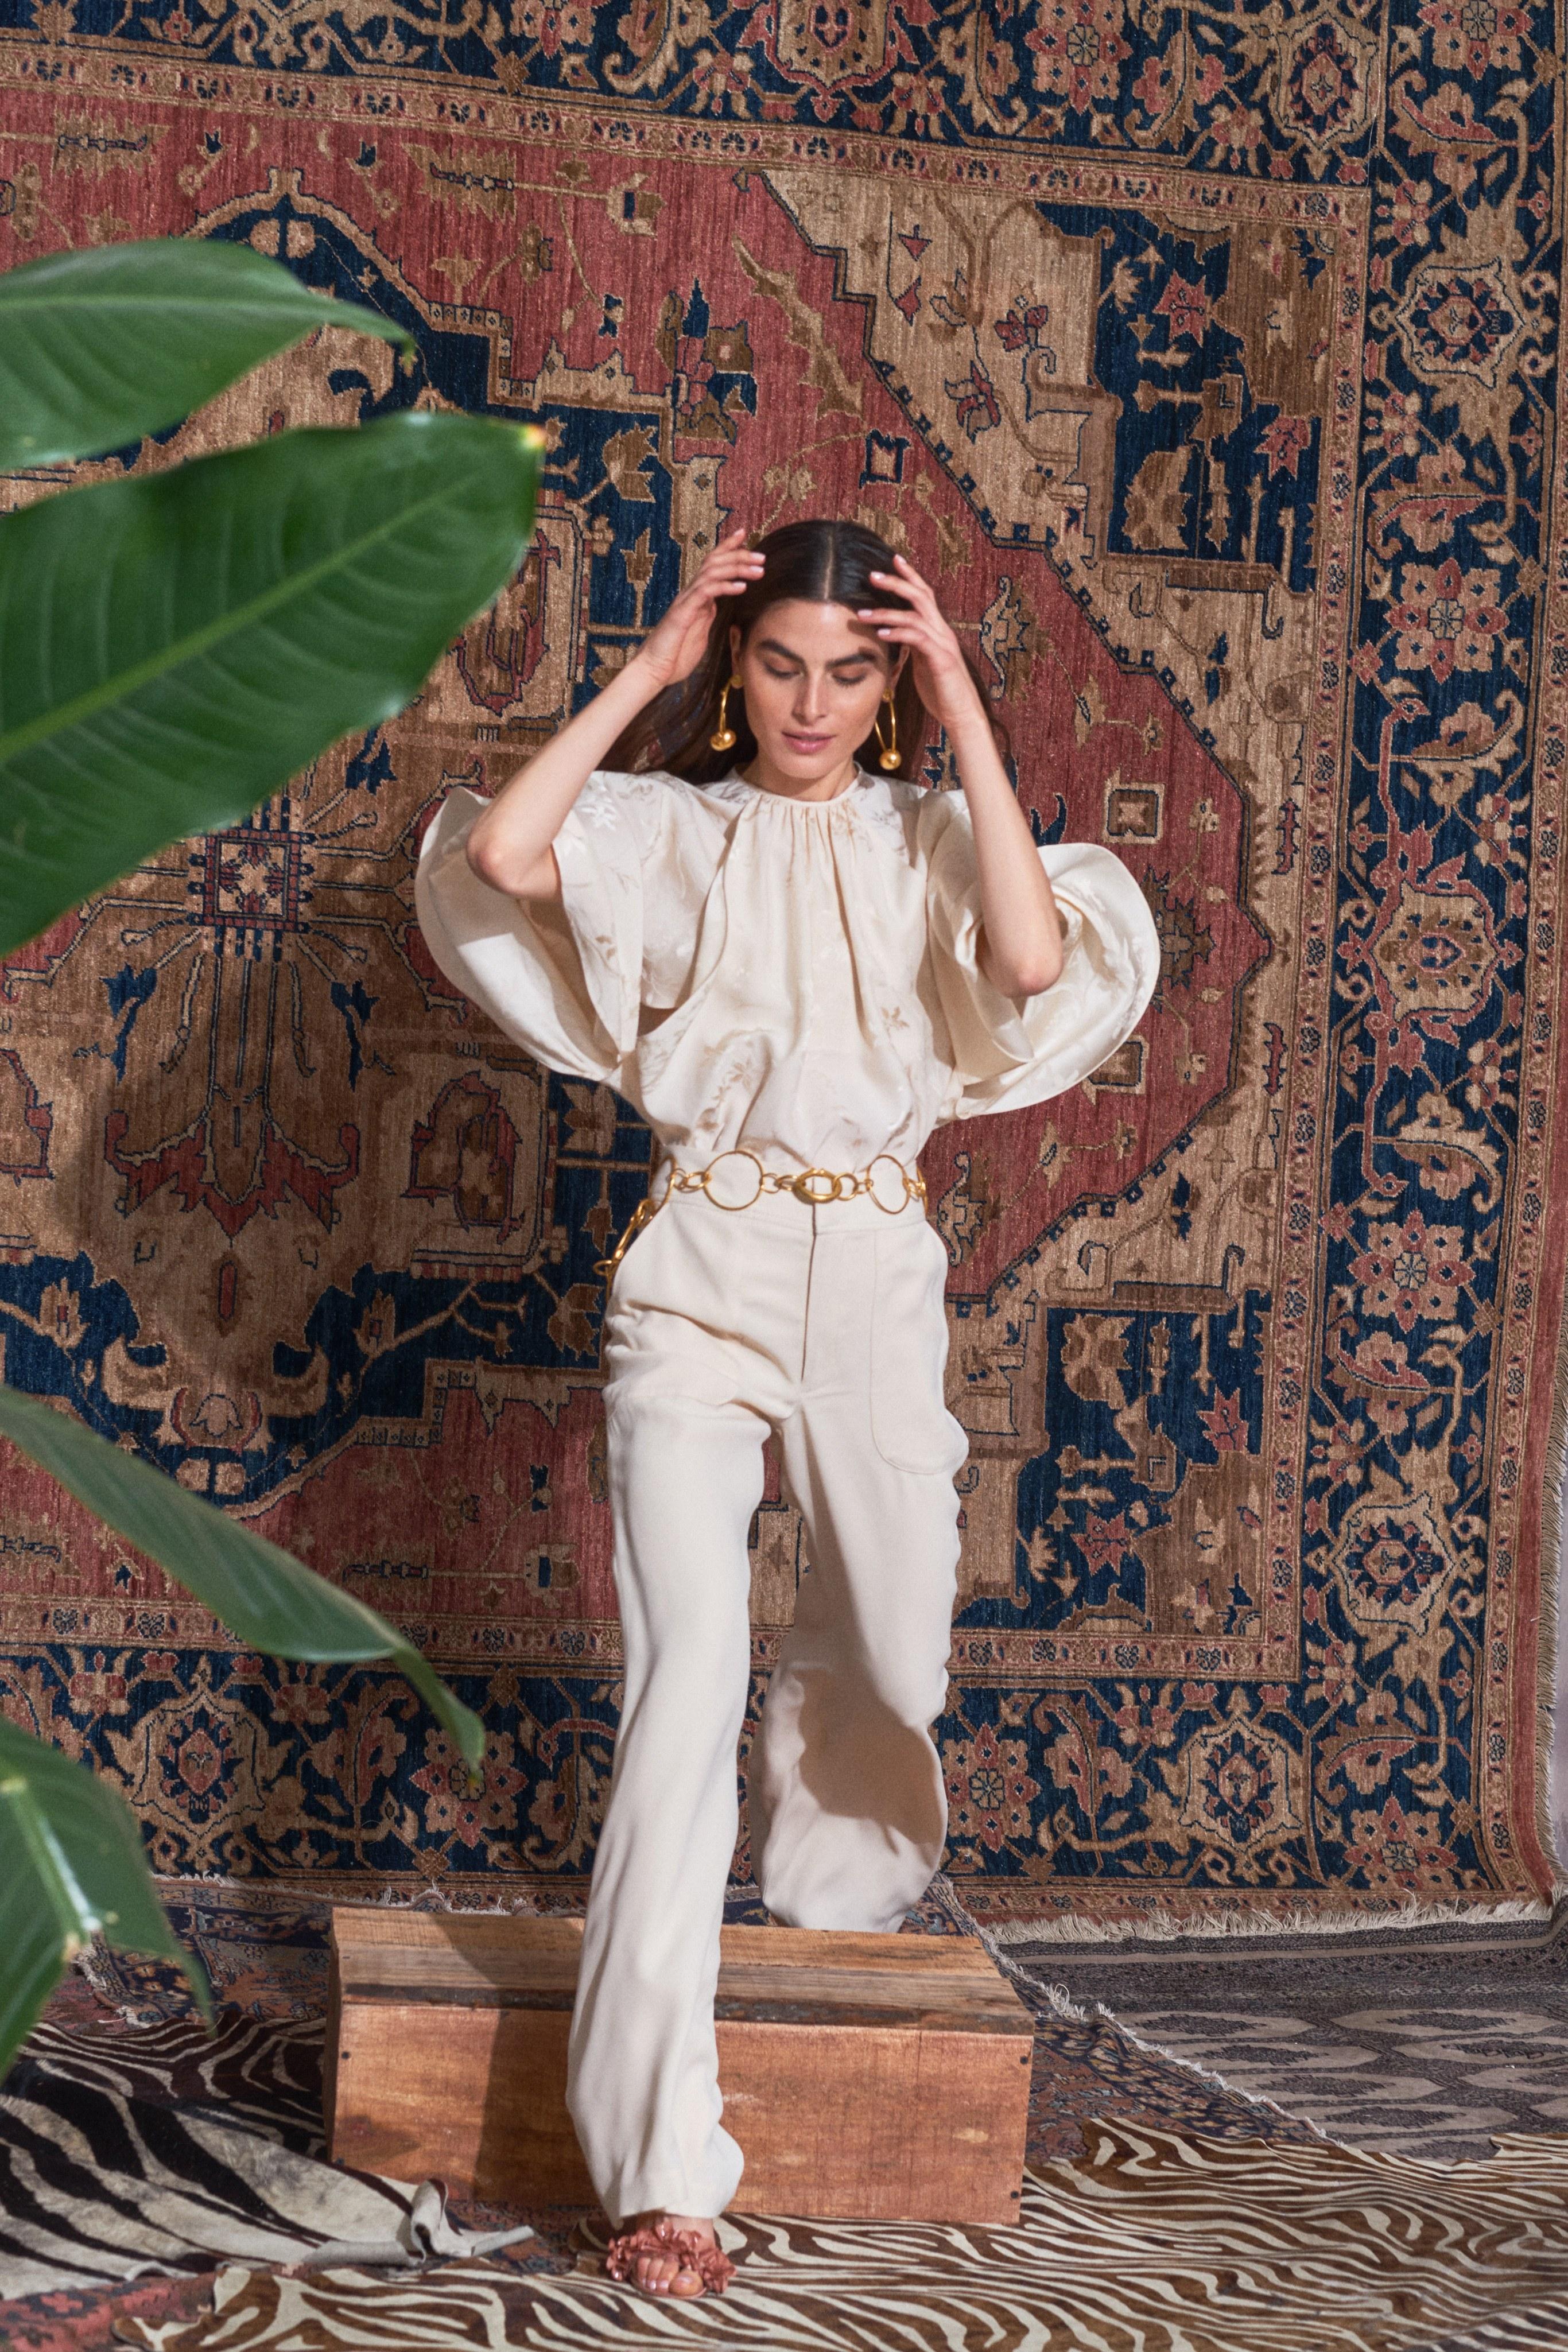 00019-Johanna-Ortiz-New-York-Pre-Fall-2019